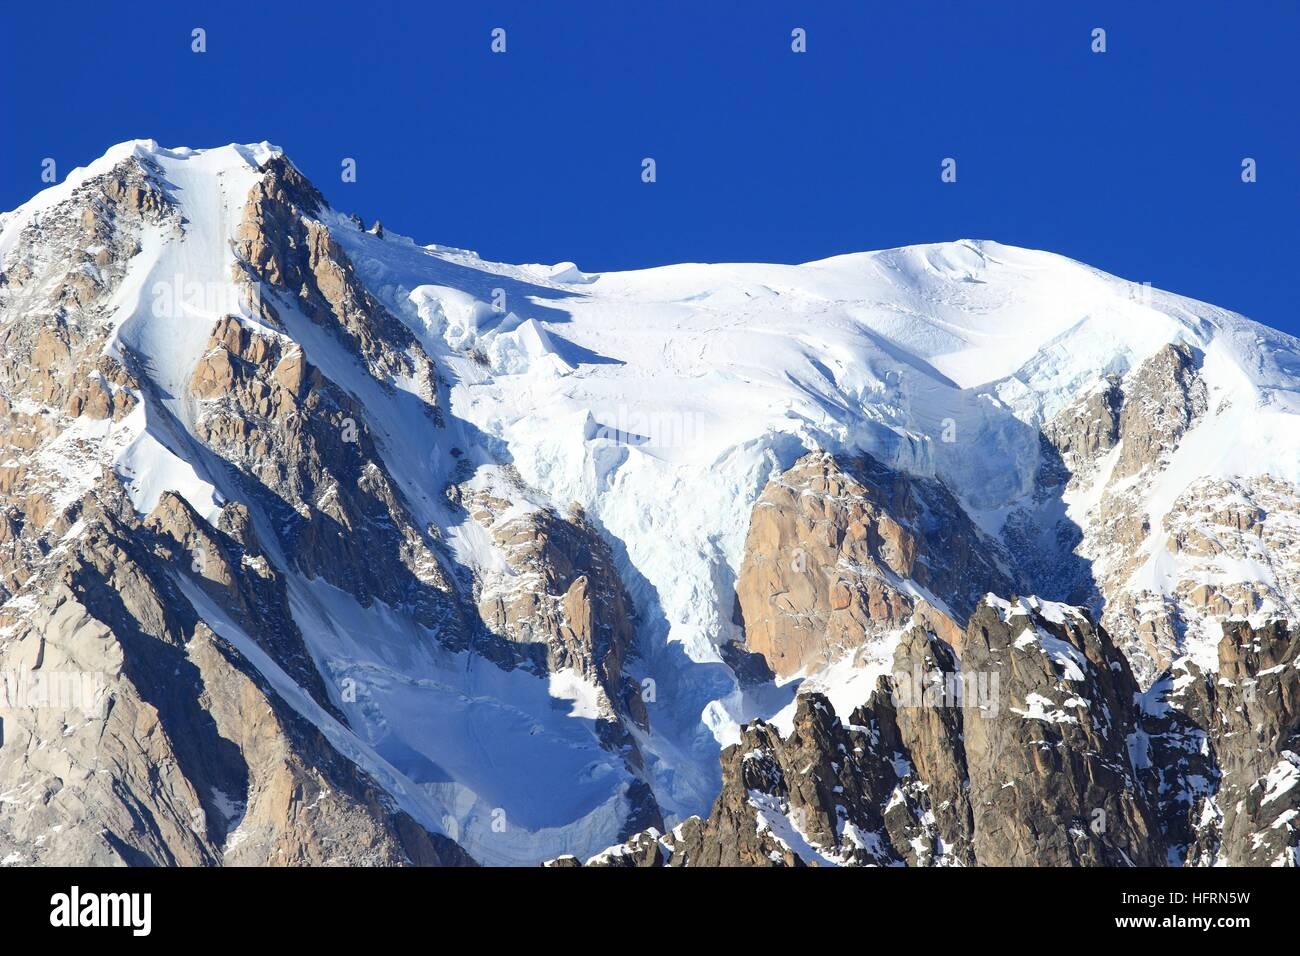 Mont Blanc peak on France- Italy border. Highest peaks in Alps. Stock Photo